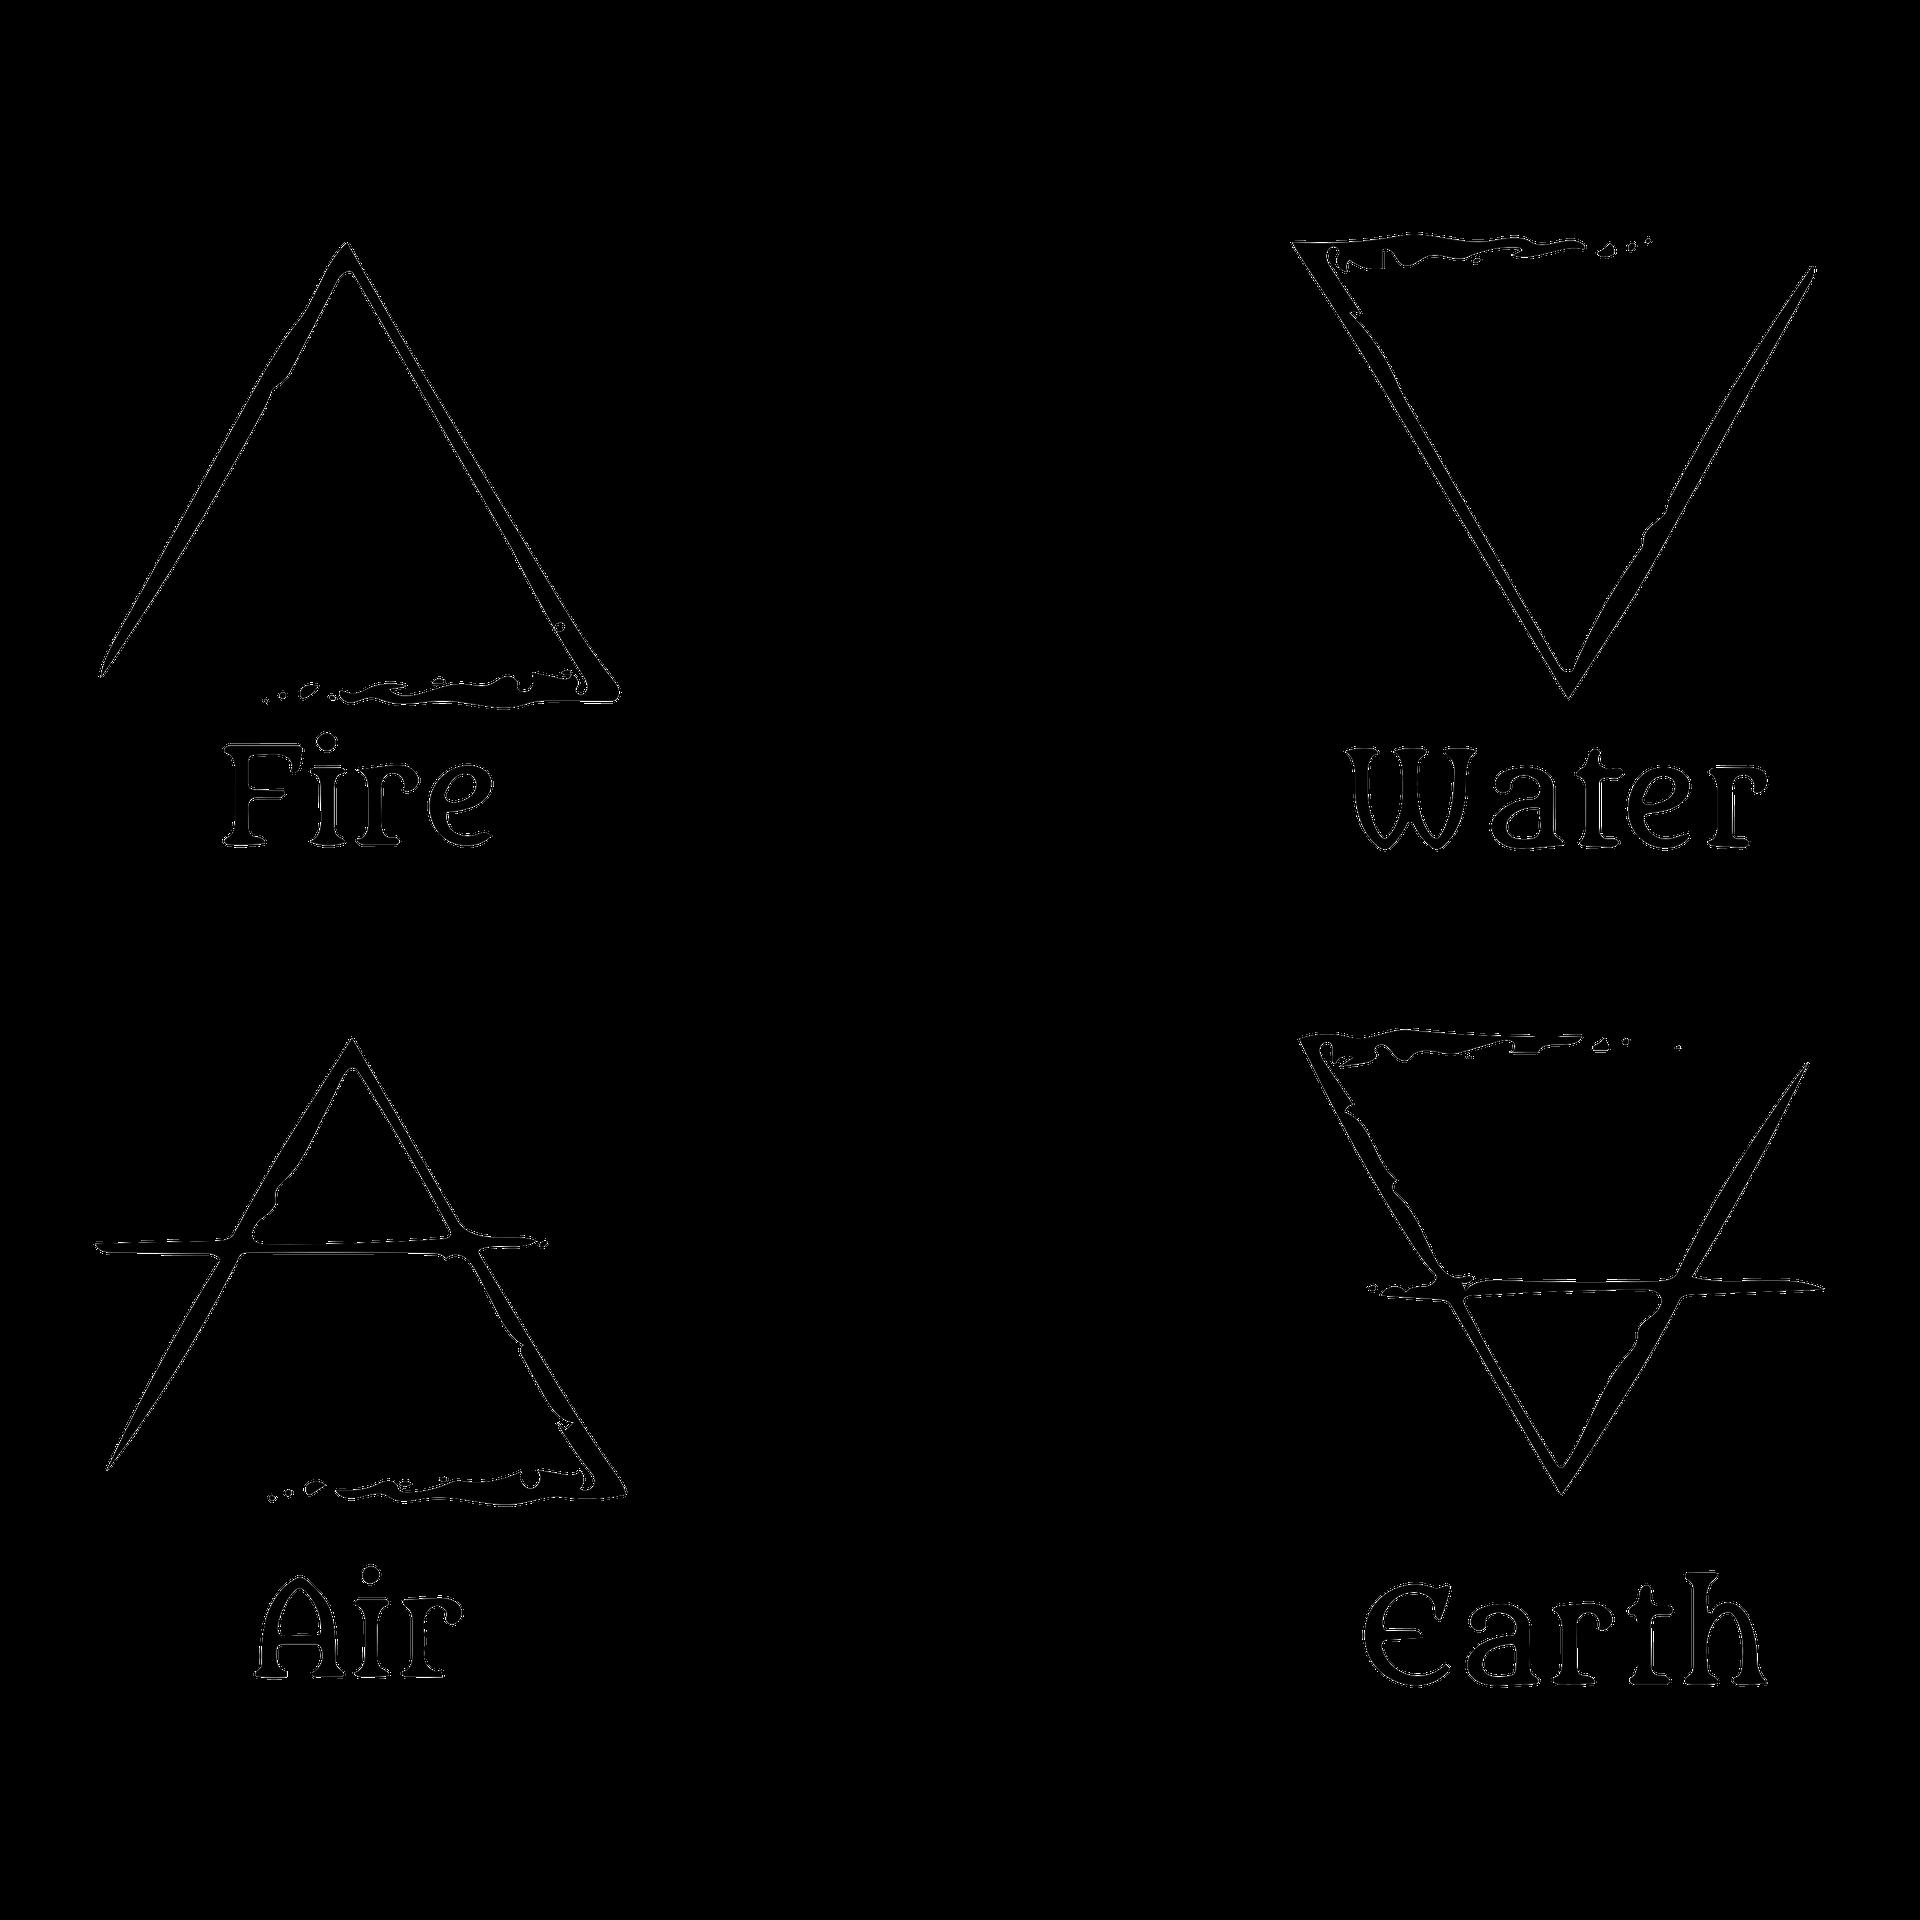 elements-2147497_1920